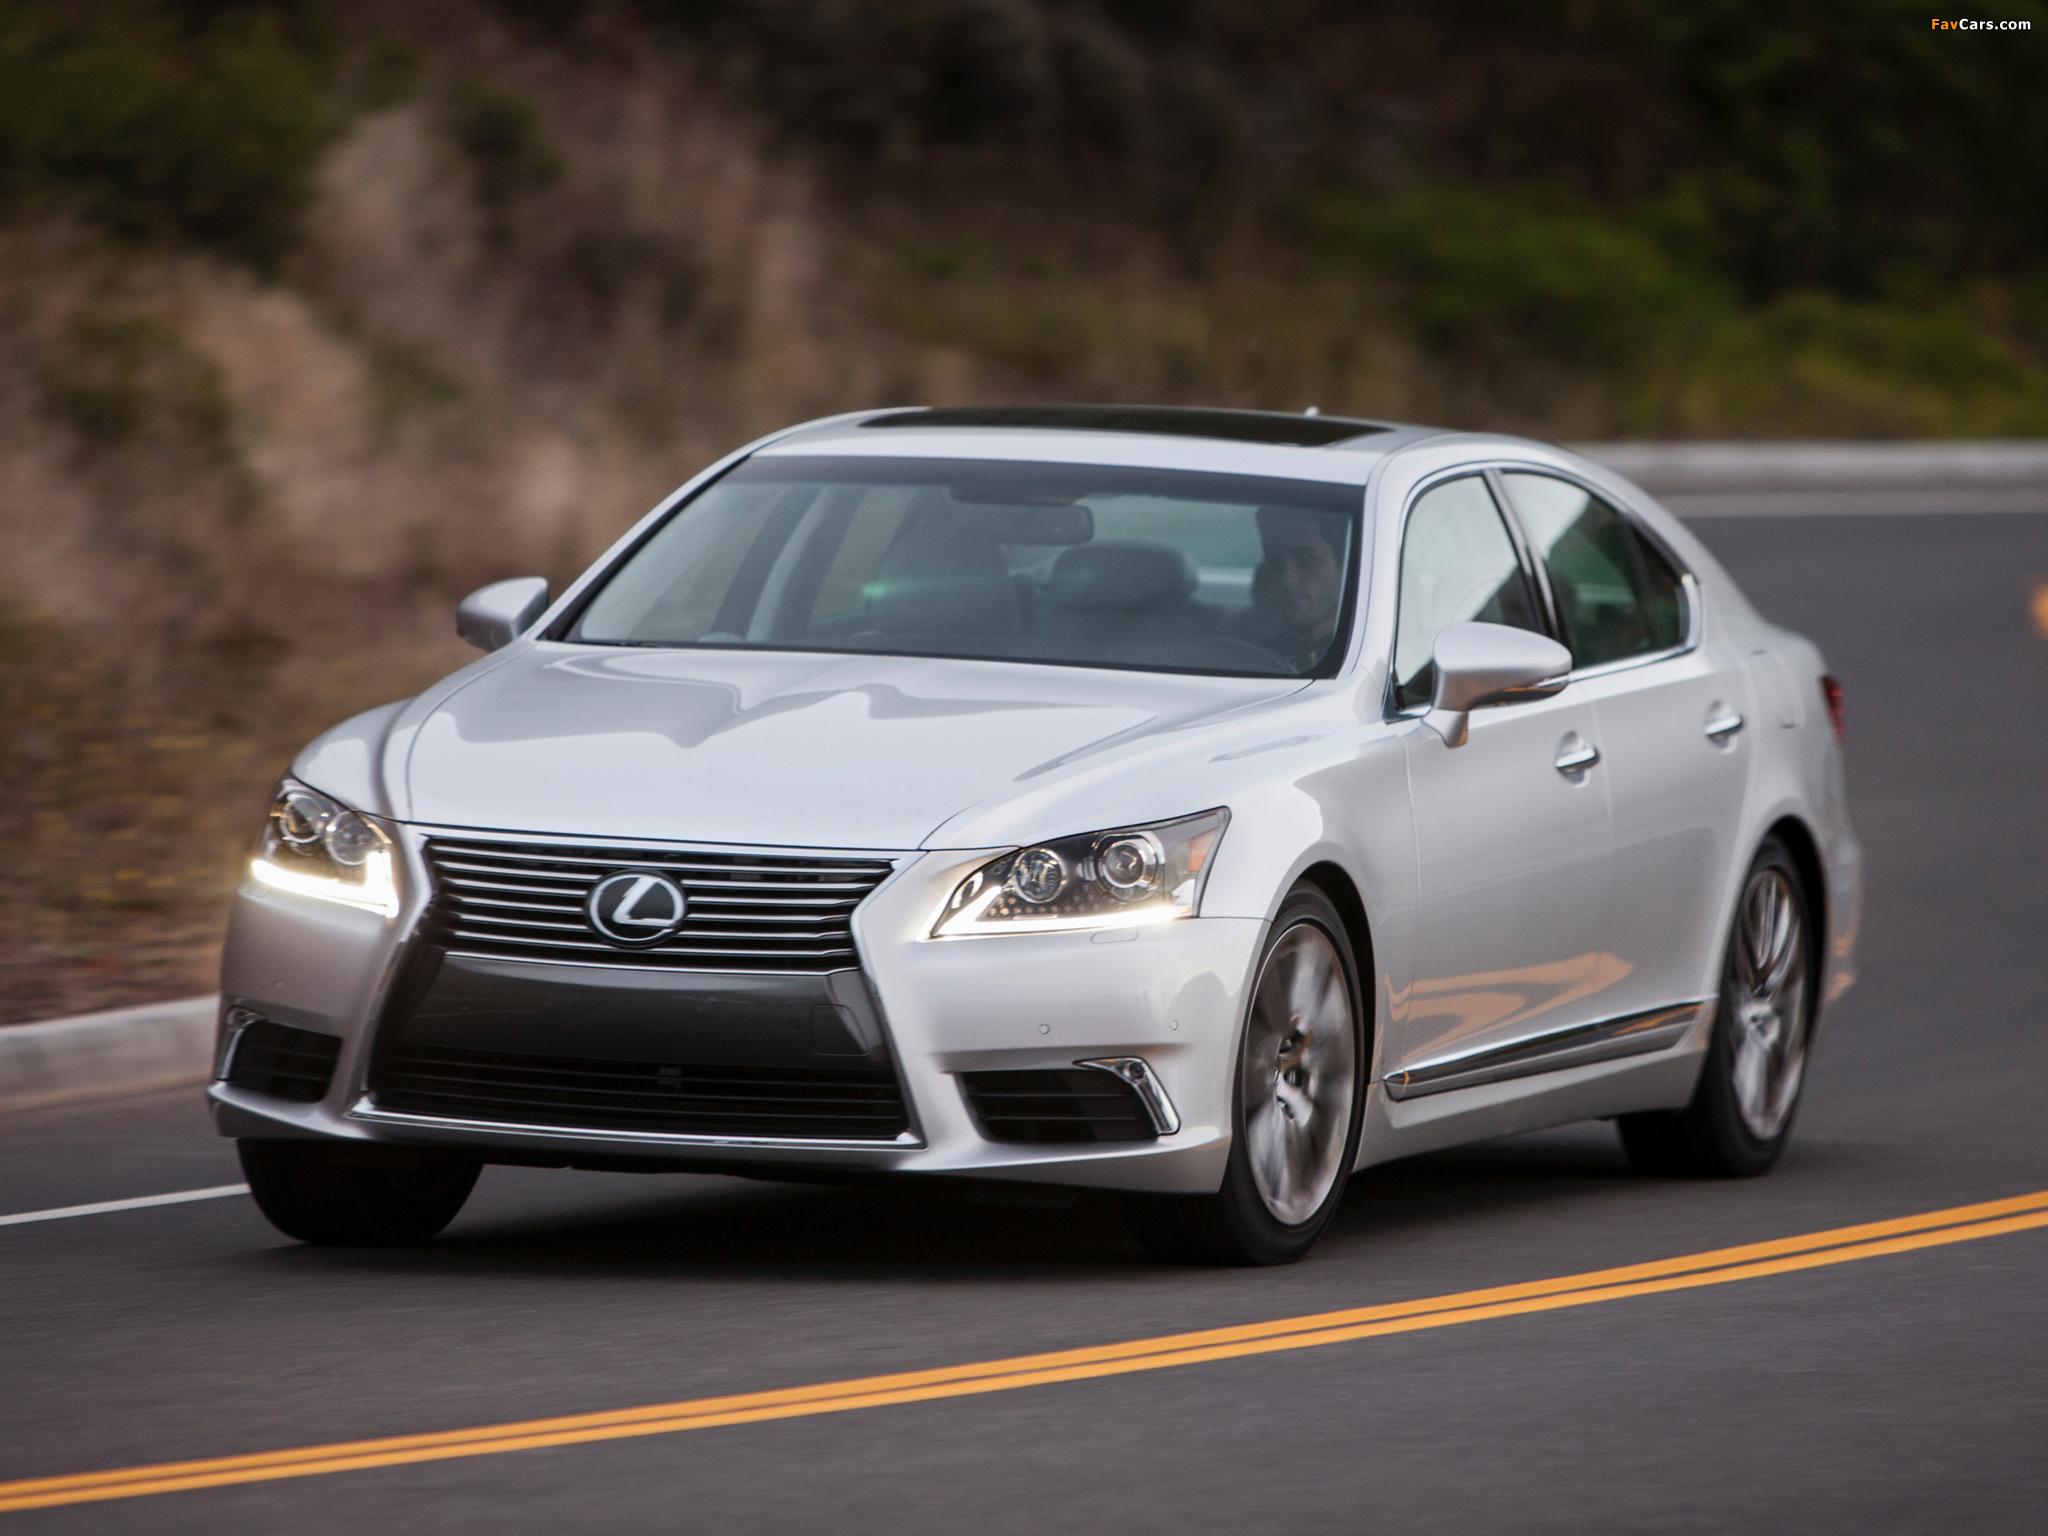 Lexus LS 460 2012 pictures (2048 x 1536)